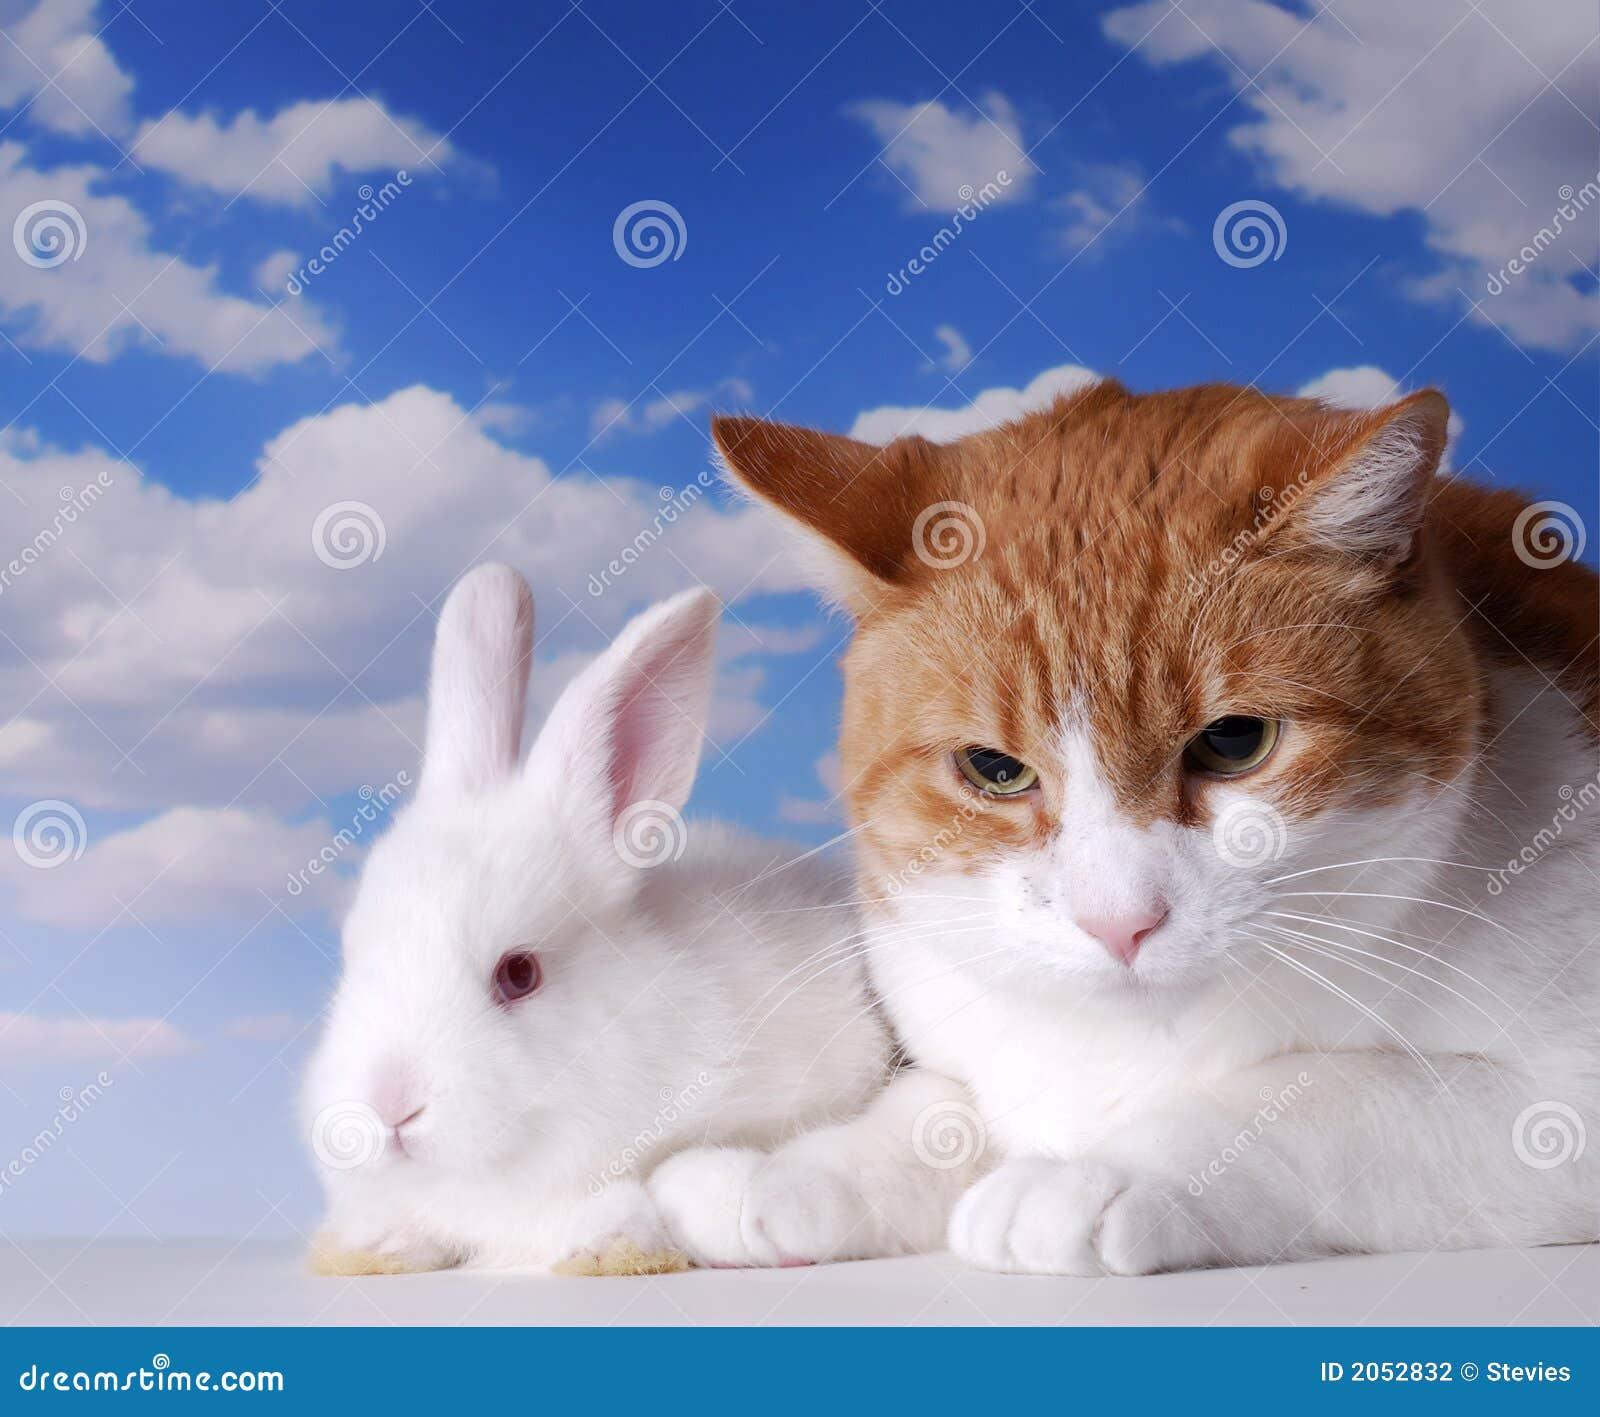 Lapin et chat blancs